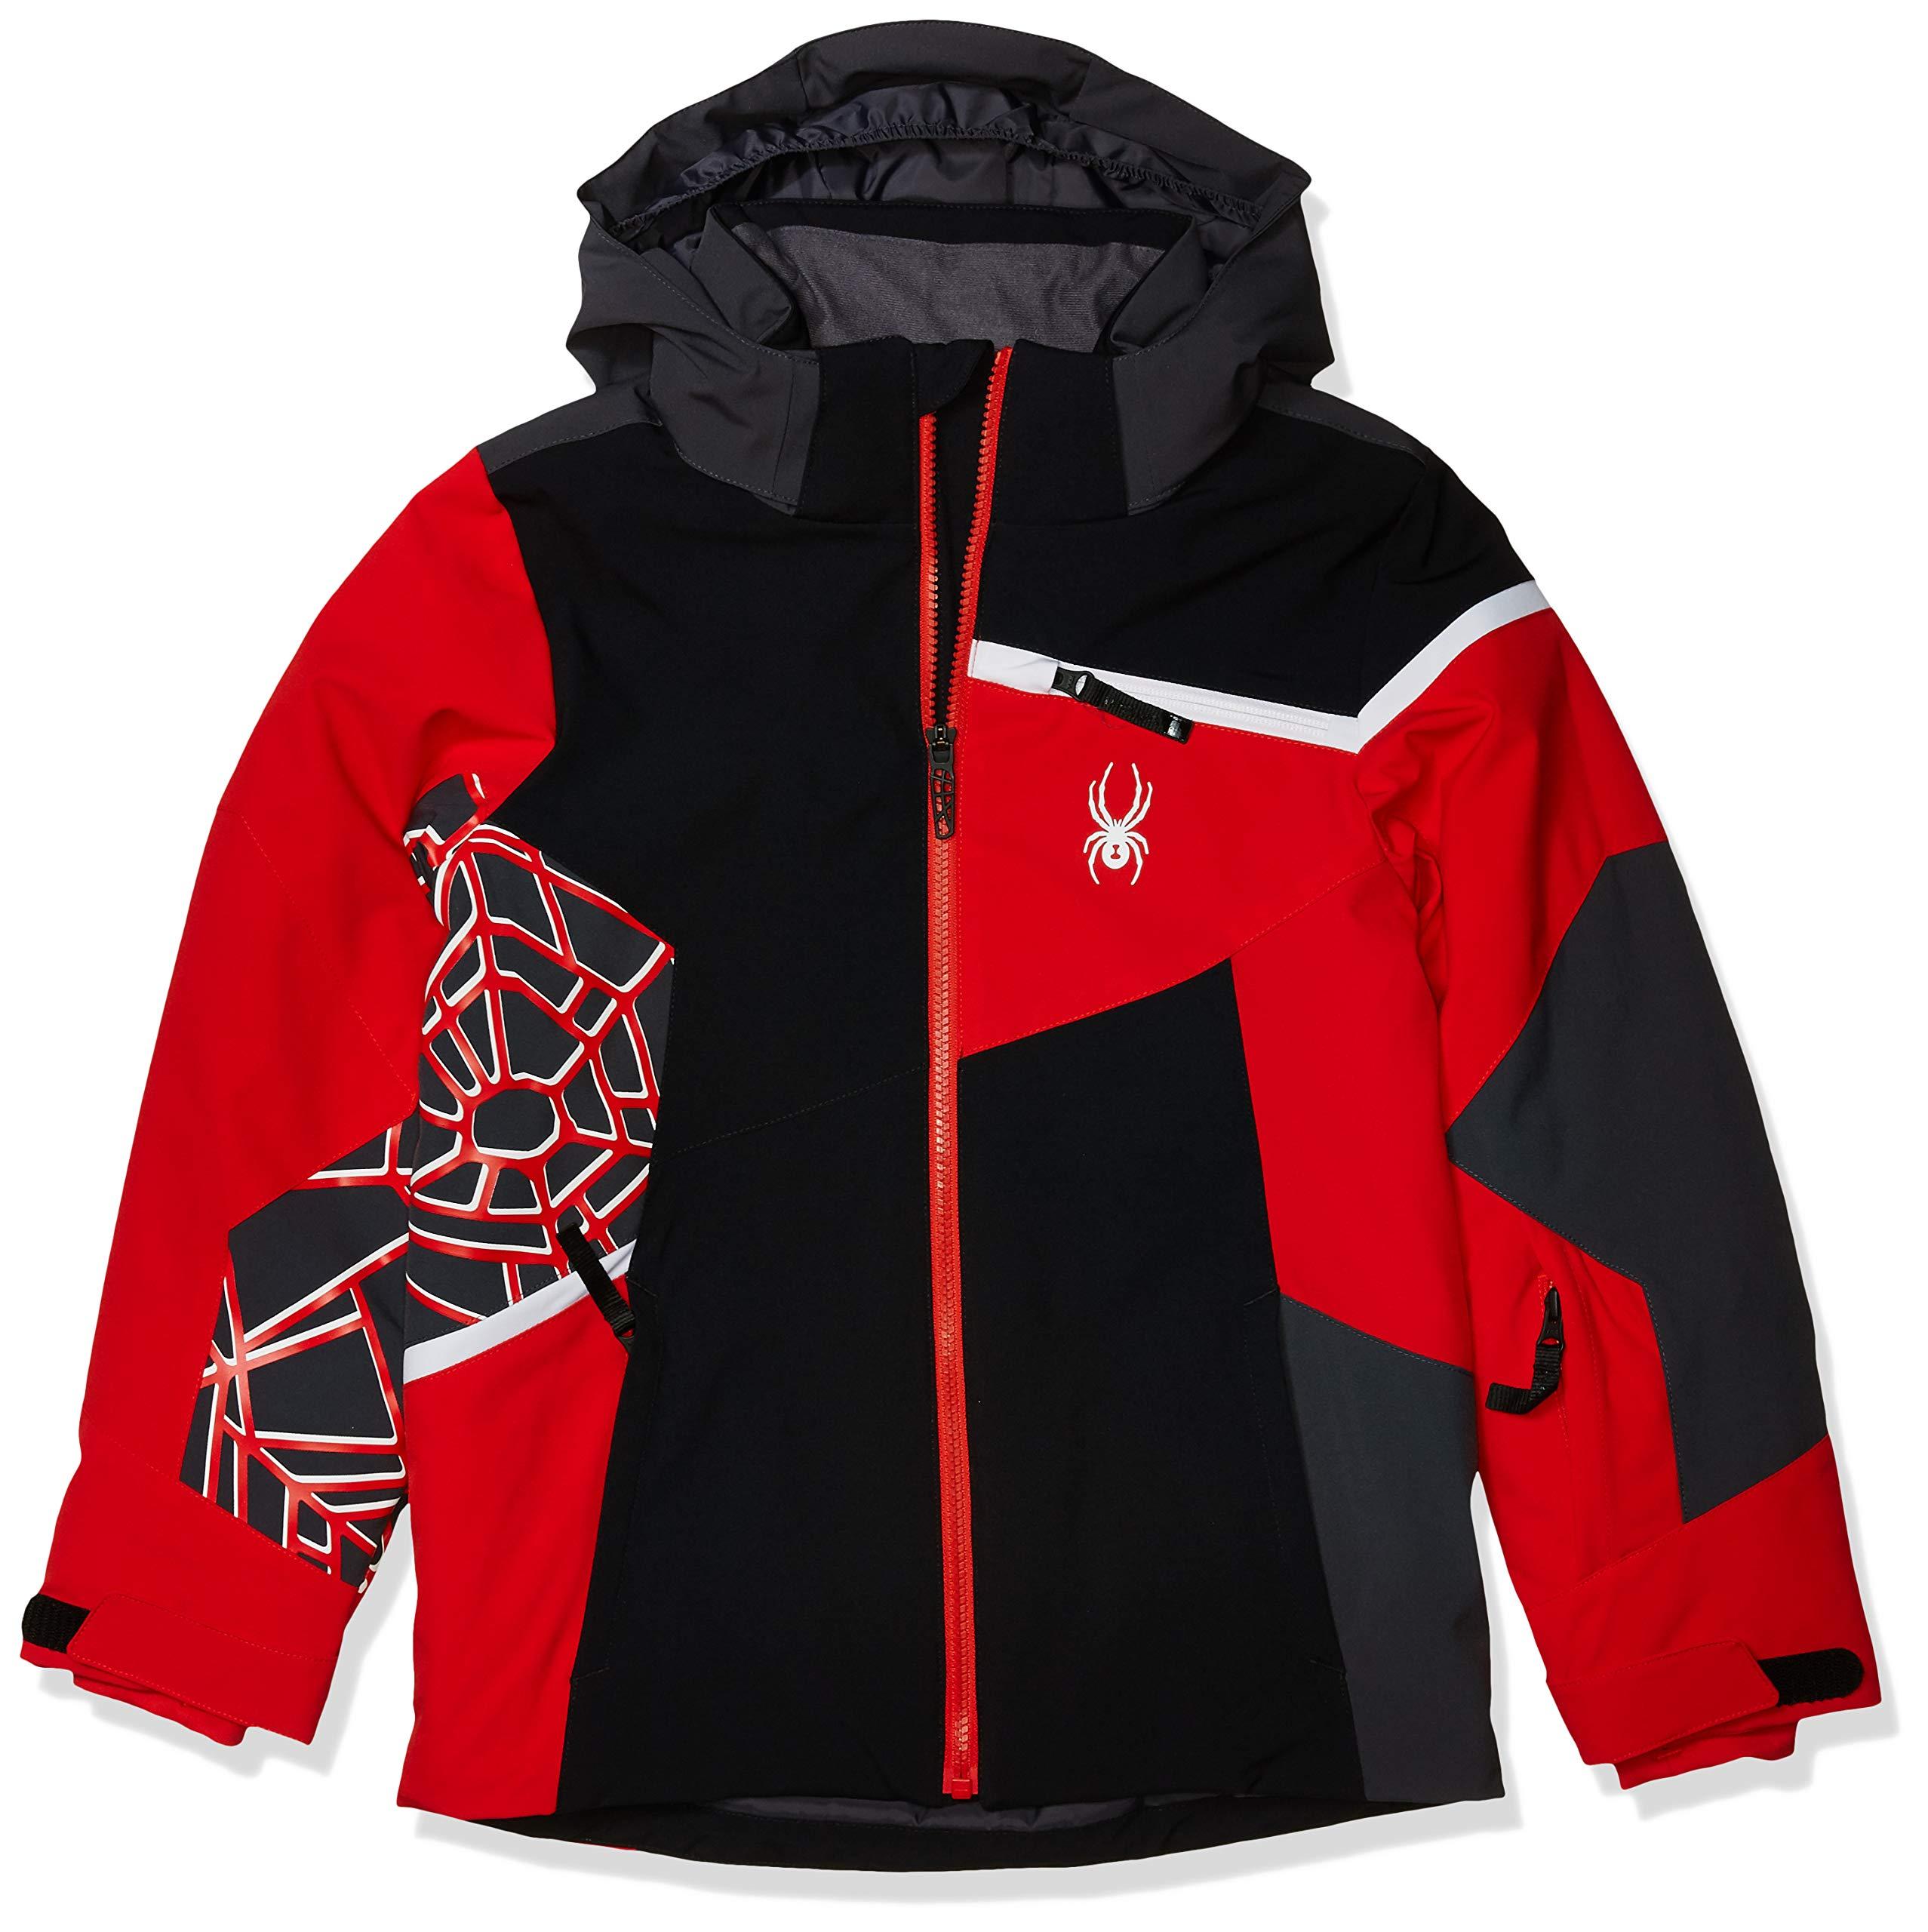 Spyder Boy's Challenger Ski Jacket – Kids Full Zip Hooded Winter Coat